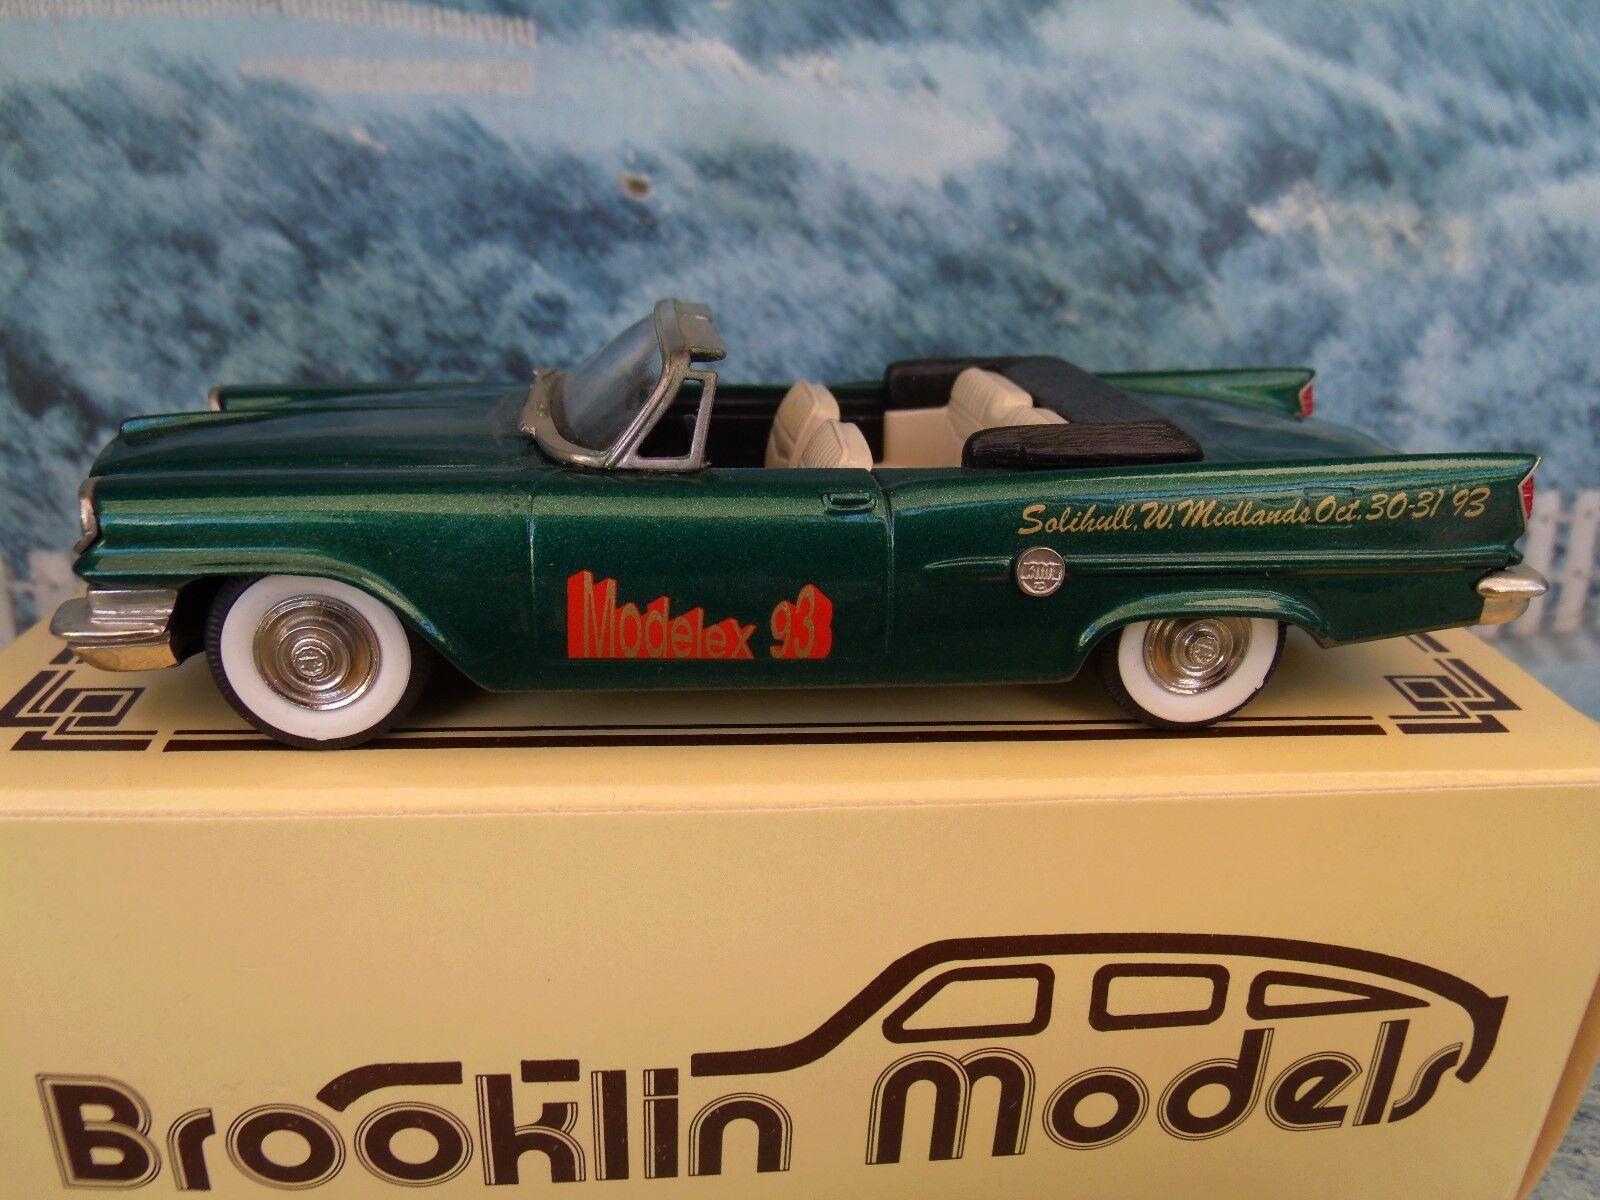 1/43 Brooklin models 1959 Chrysler 300E 300E 300E  Modelex 93  October 1993 6d3a78